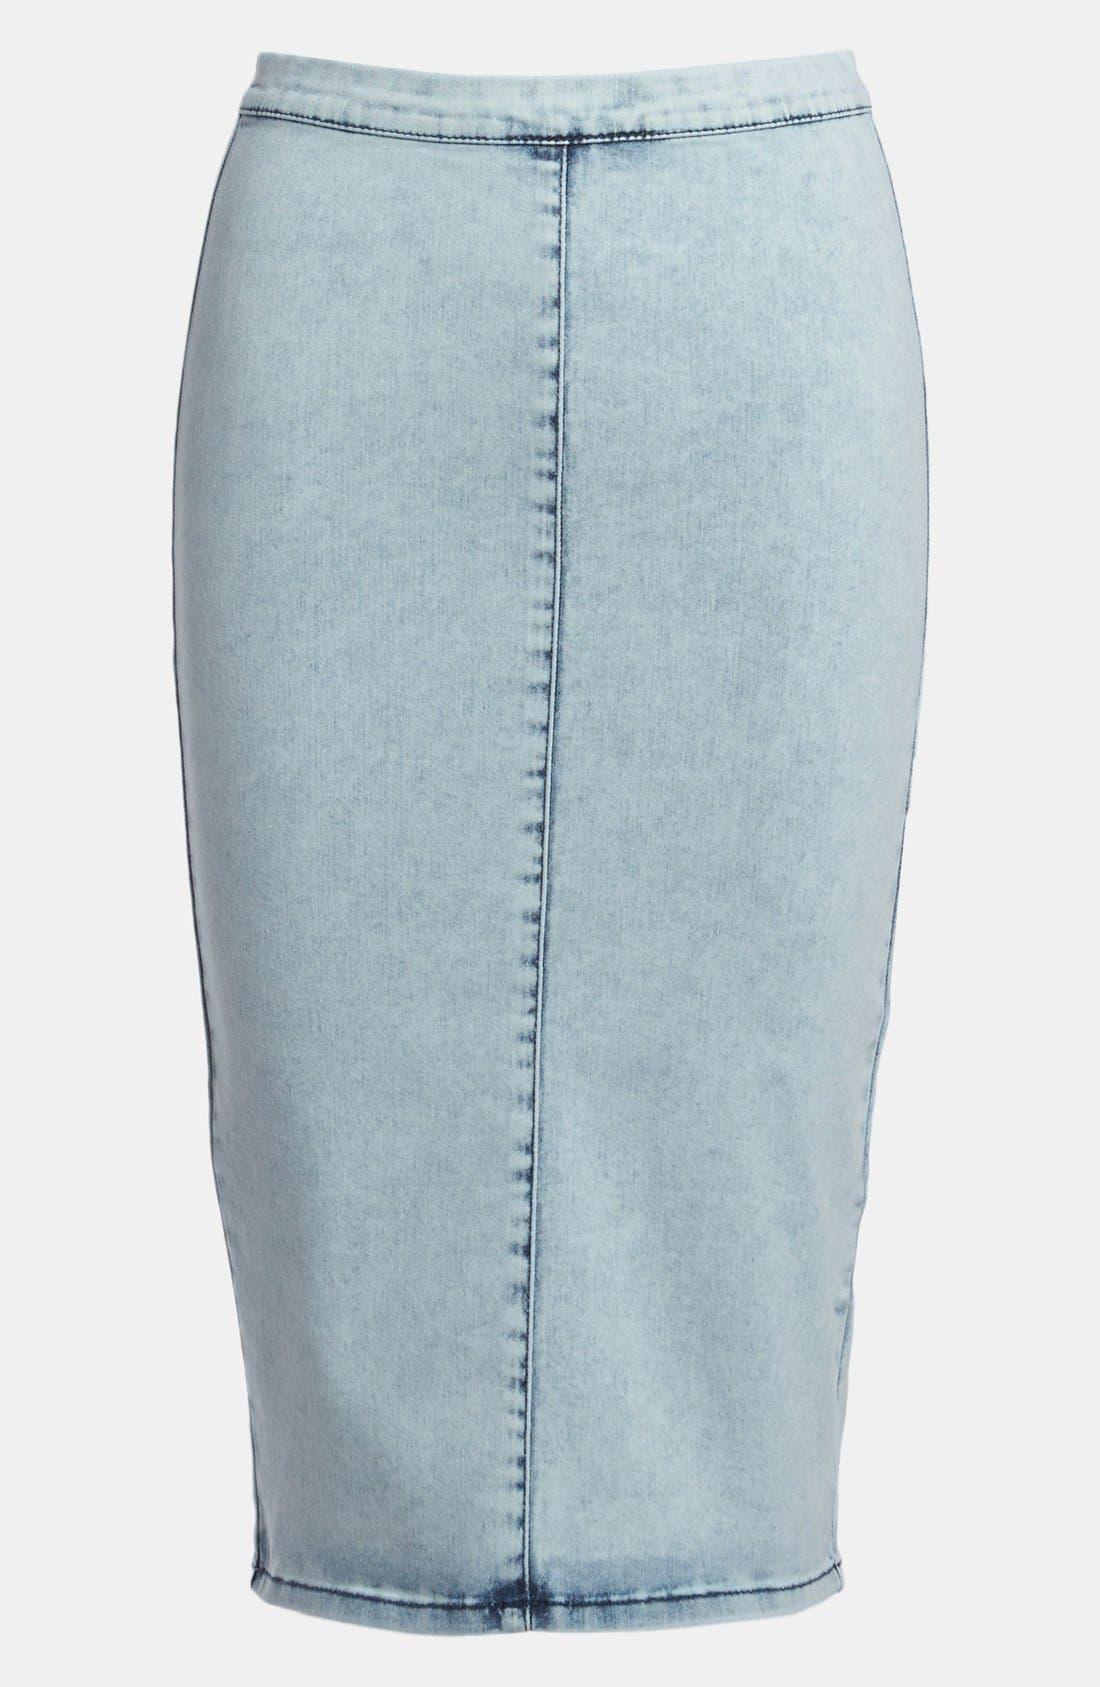 Alternate Image 1 Selected - Topshop 'Joni' Acid Wash Denim Pencil Skirt